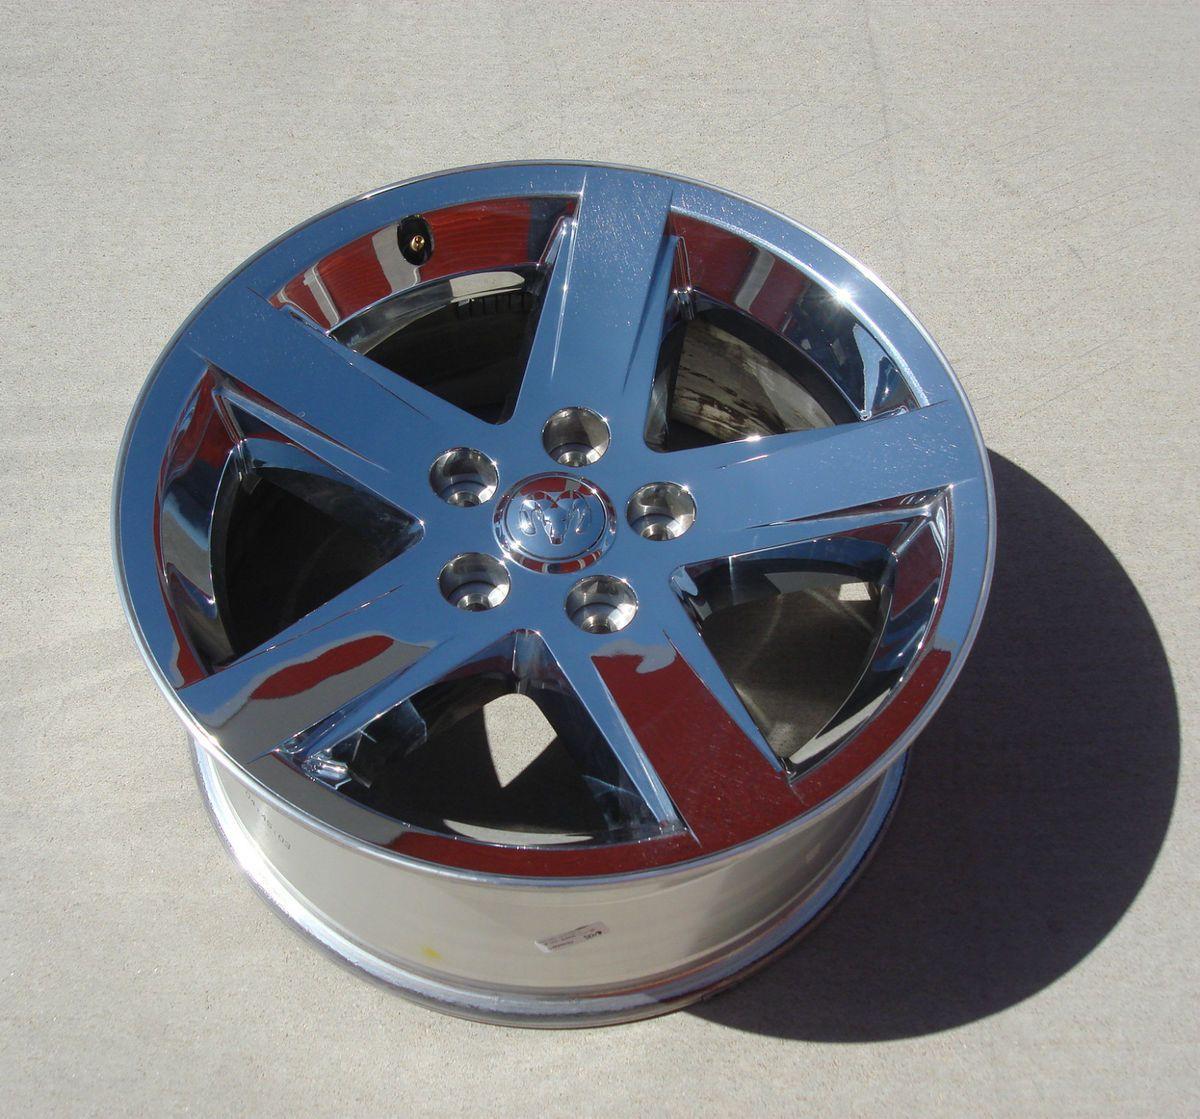 2012 Dodge Ram 20 INCH Chrome Clad Alloy Rim / Wheel, Used OEM Mopar